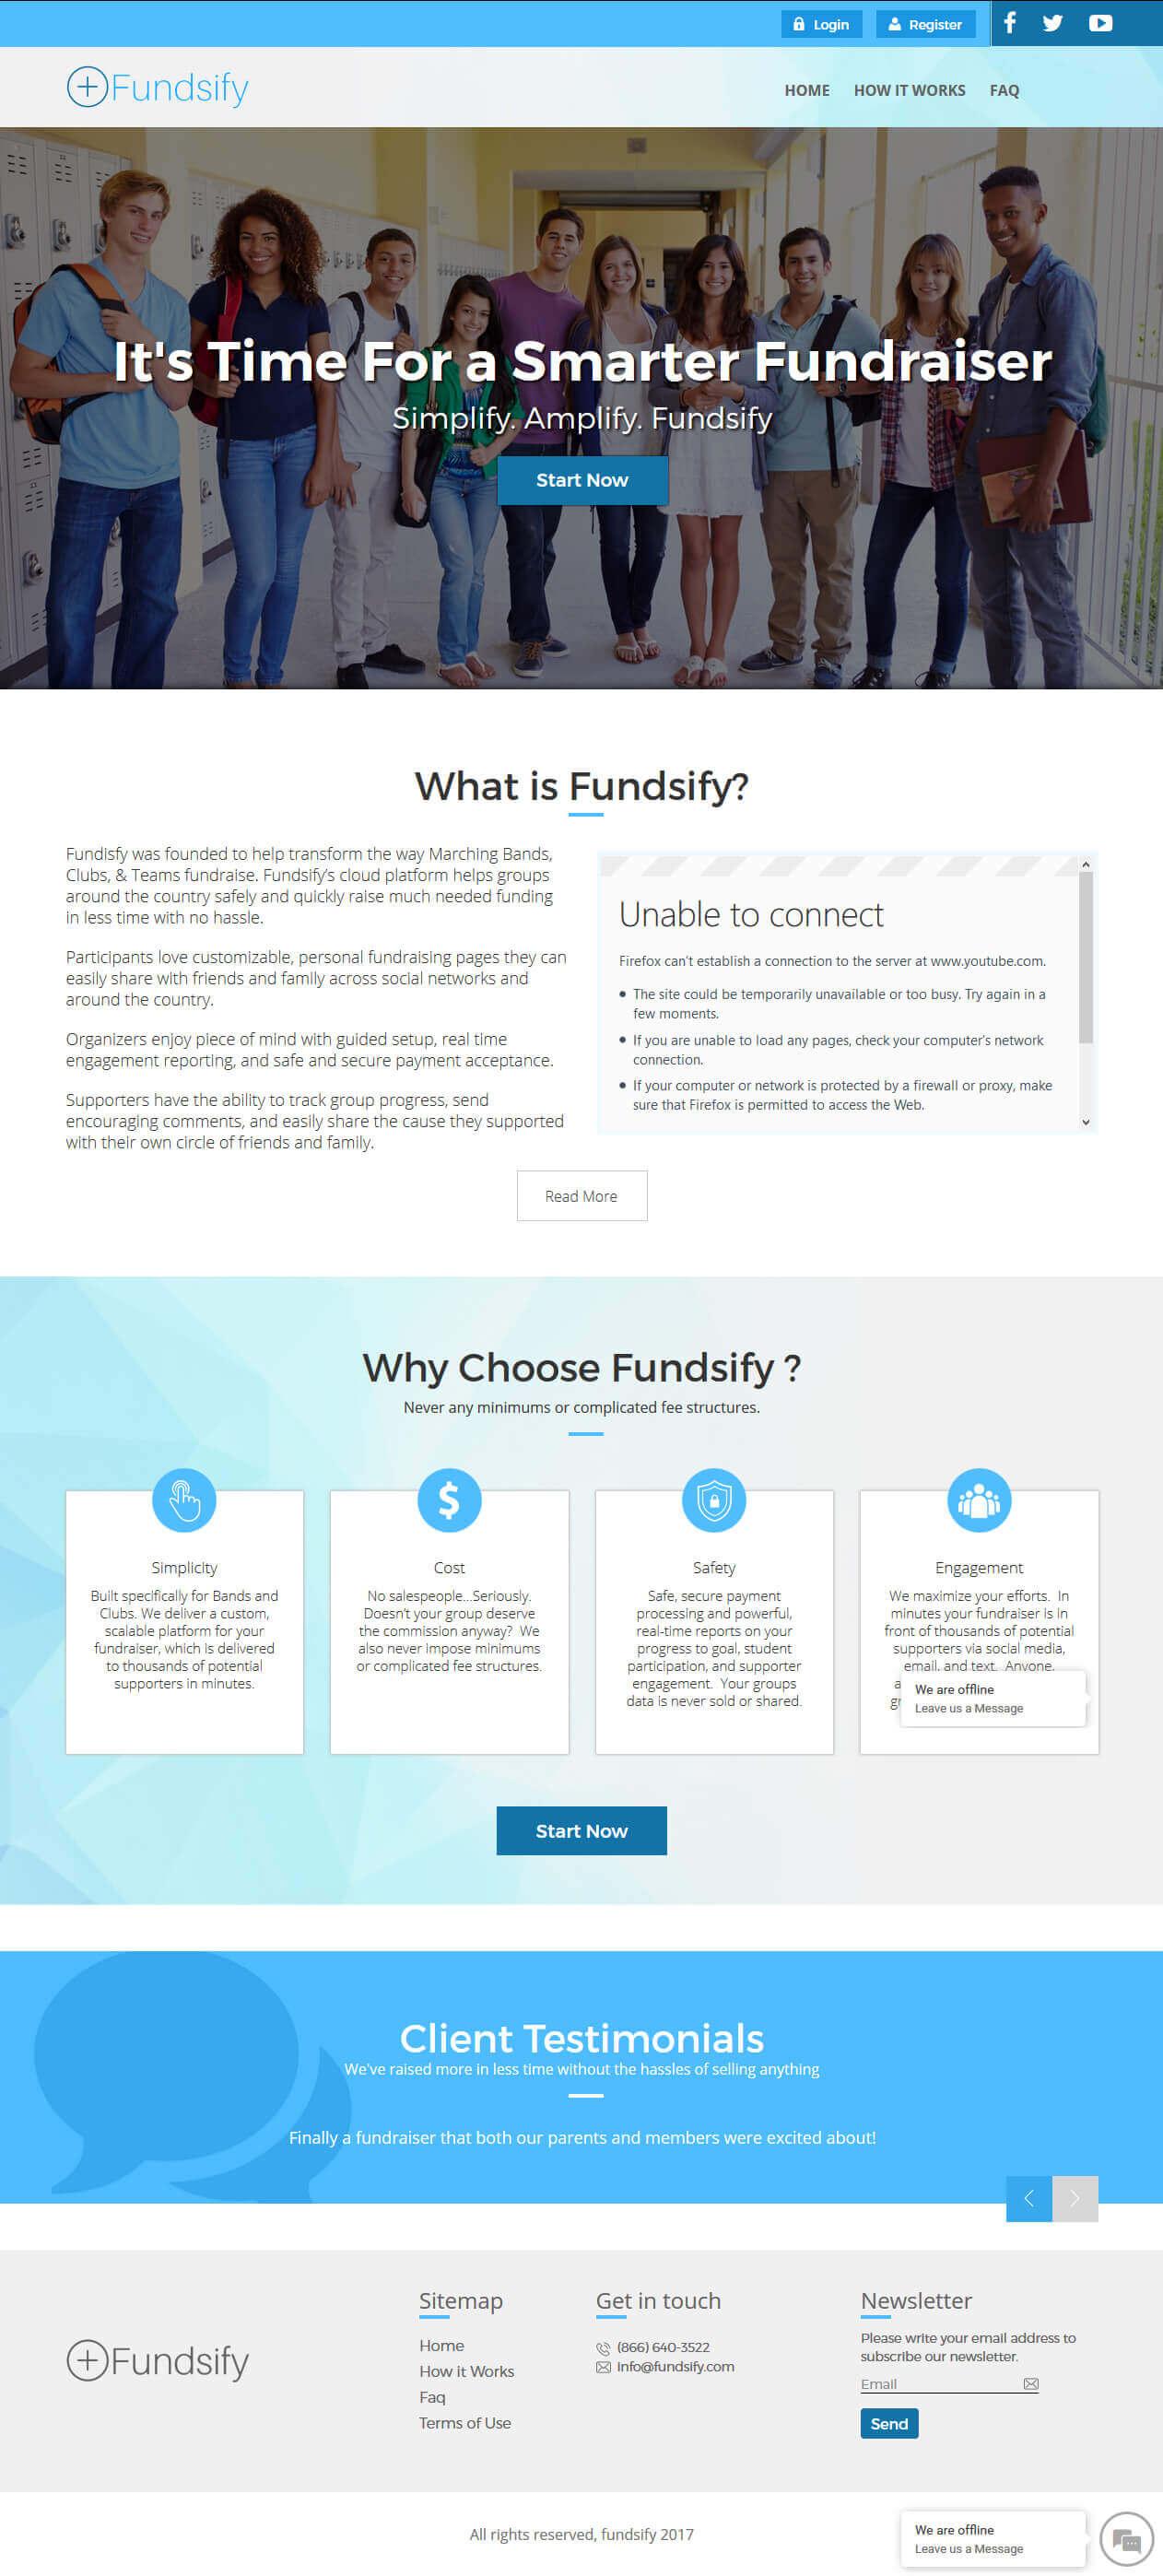 Design and Development of Fundraiser Website - Fundsify